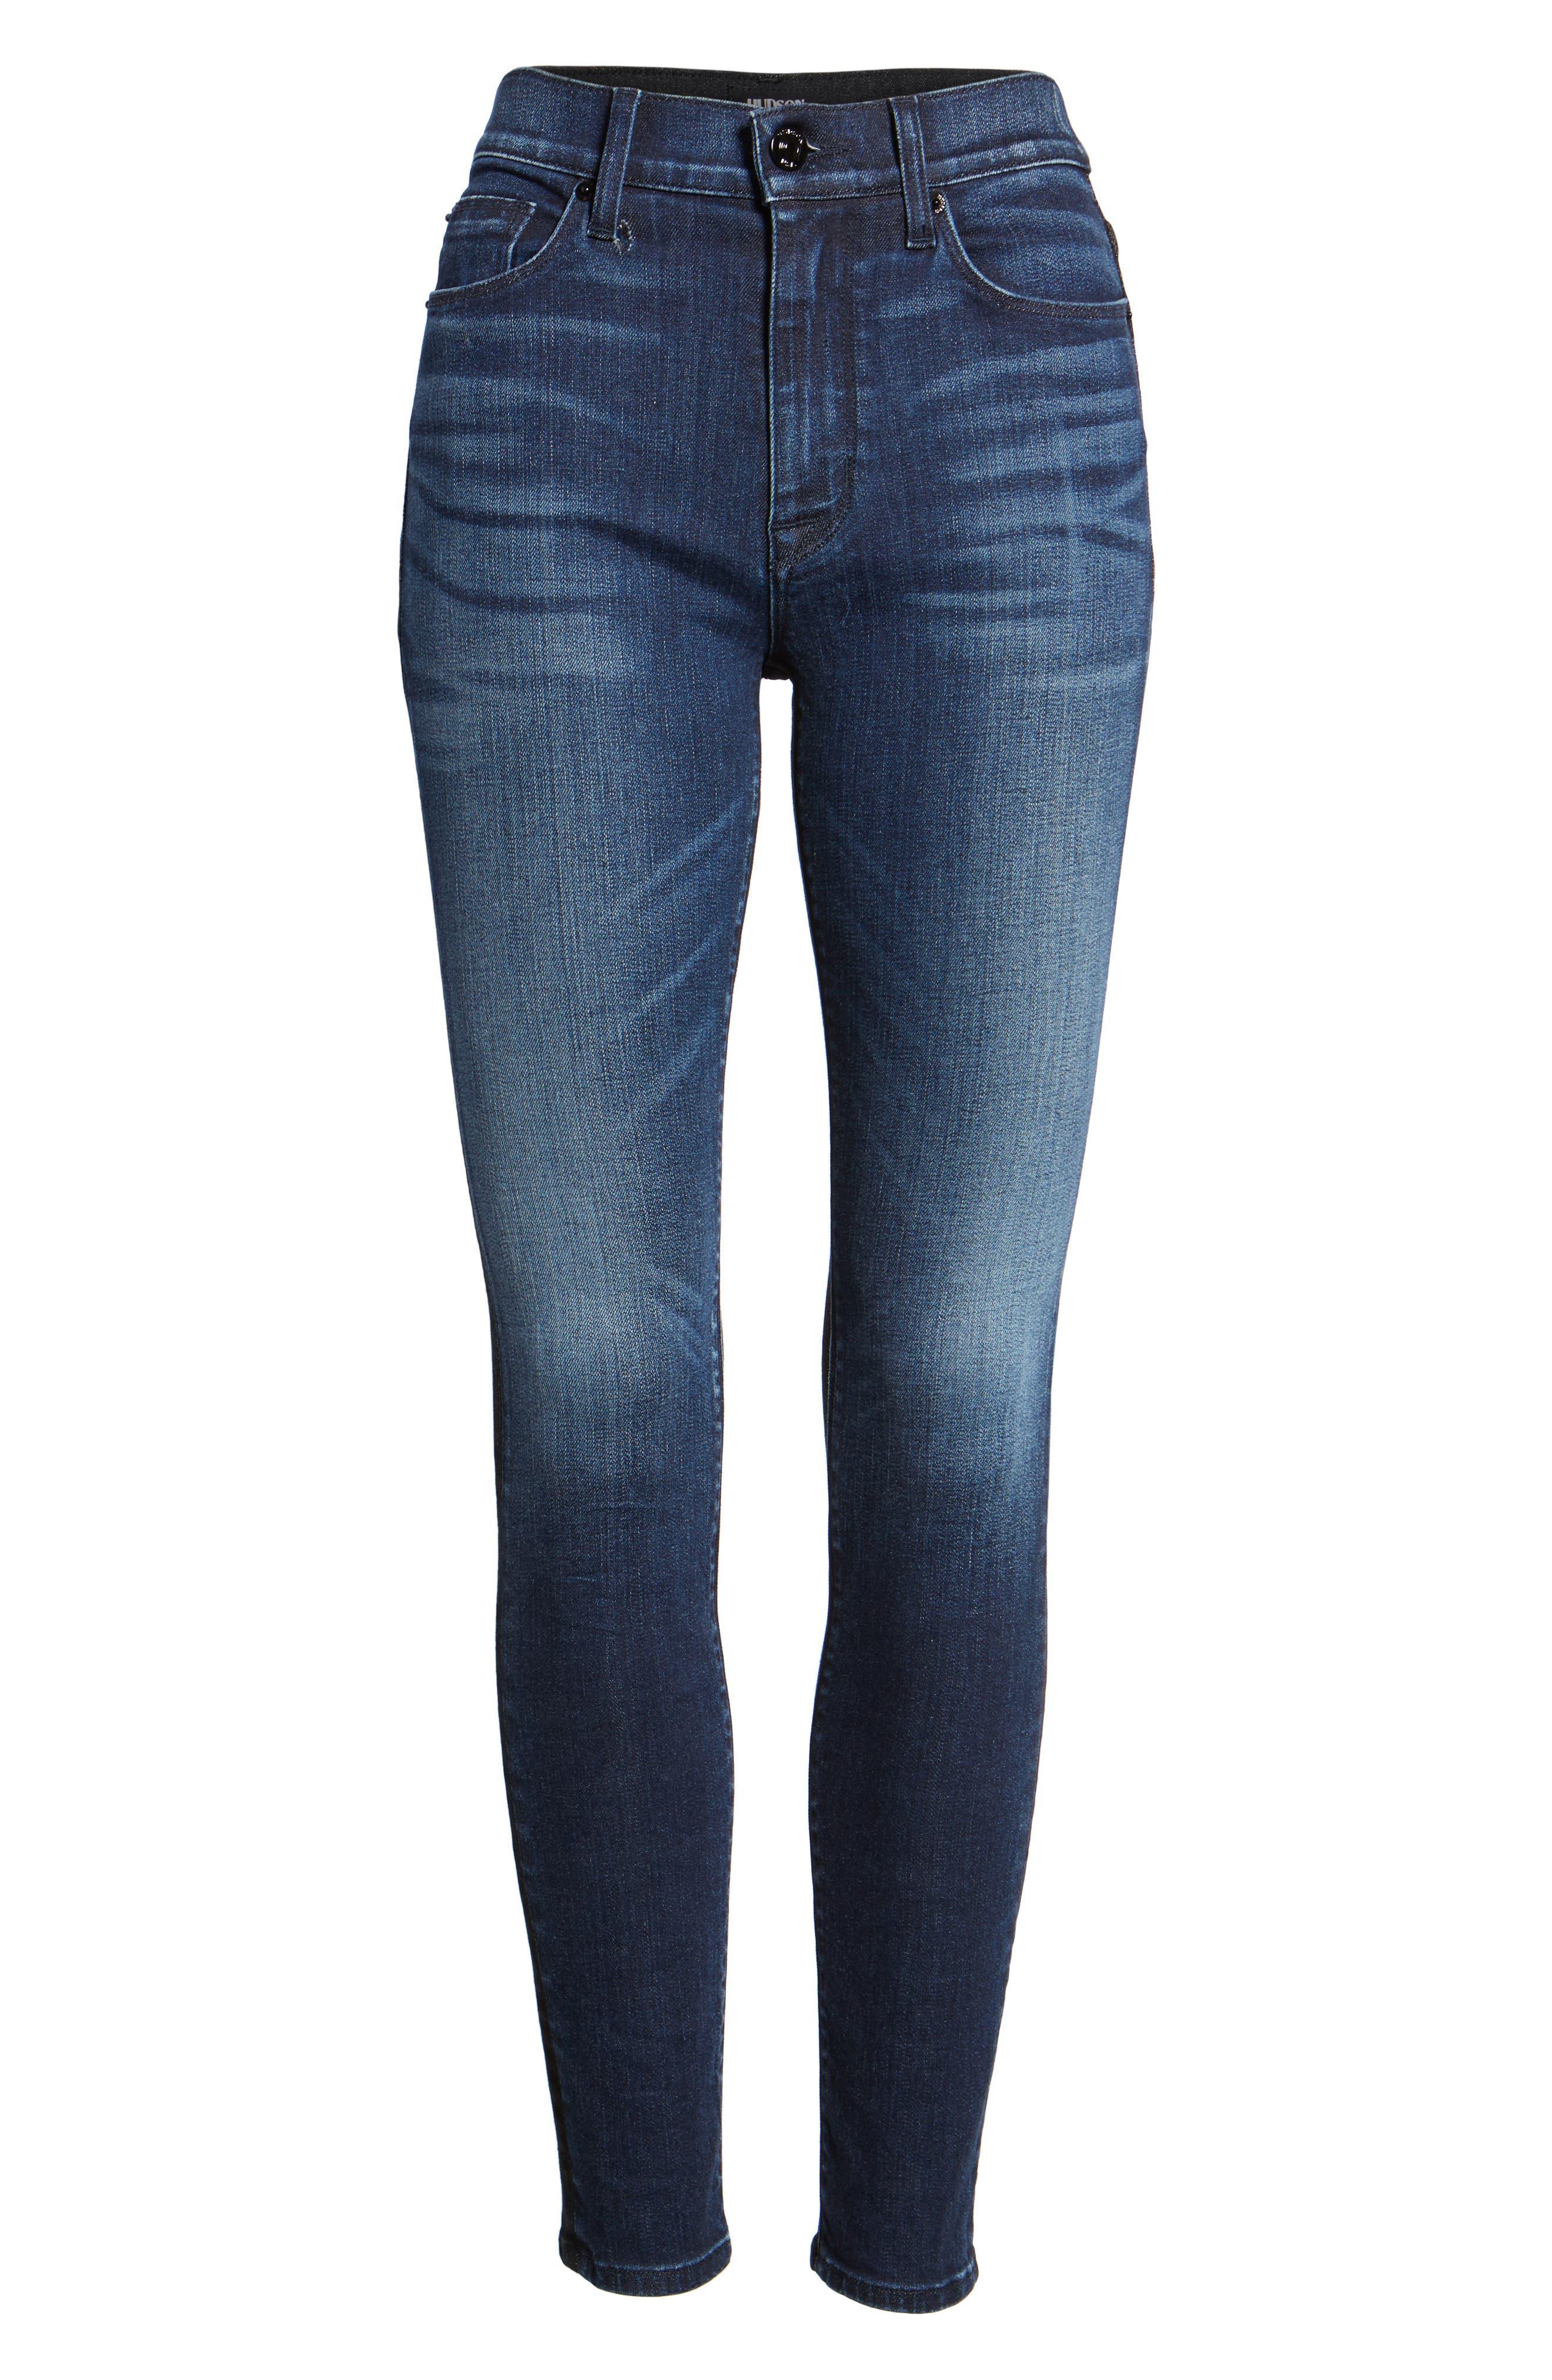 Barbara High Waist Ankle Skinny Jeans,                             Alternate thumbnail 4, color,                             Dare